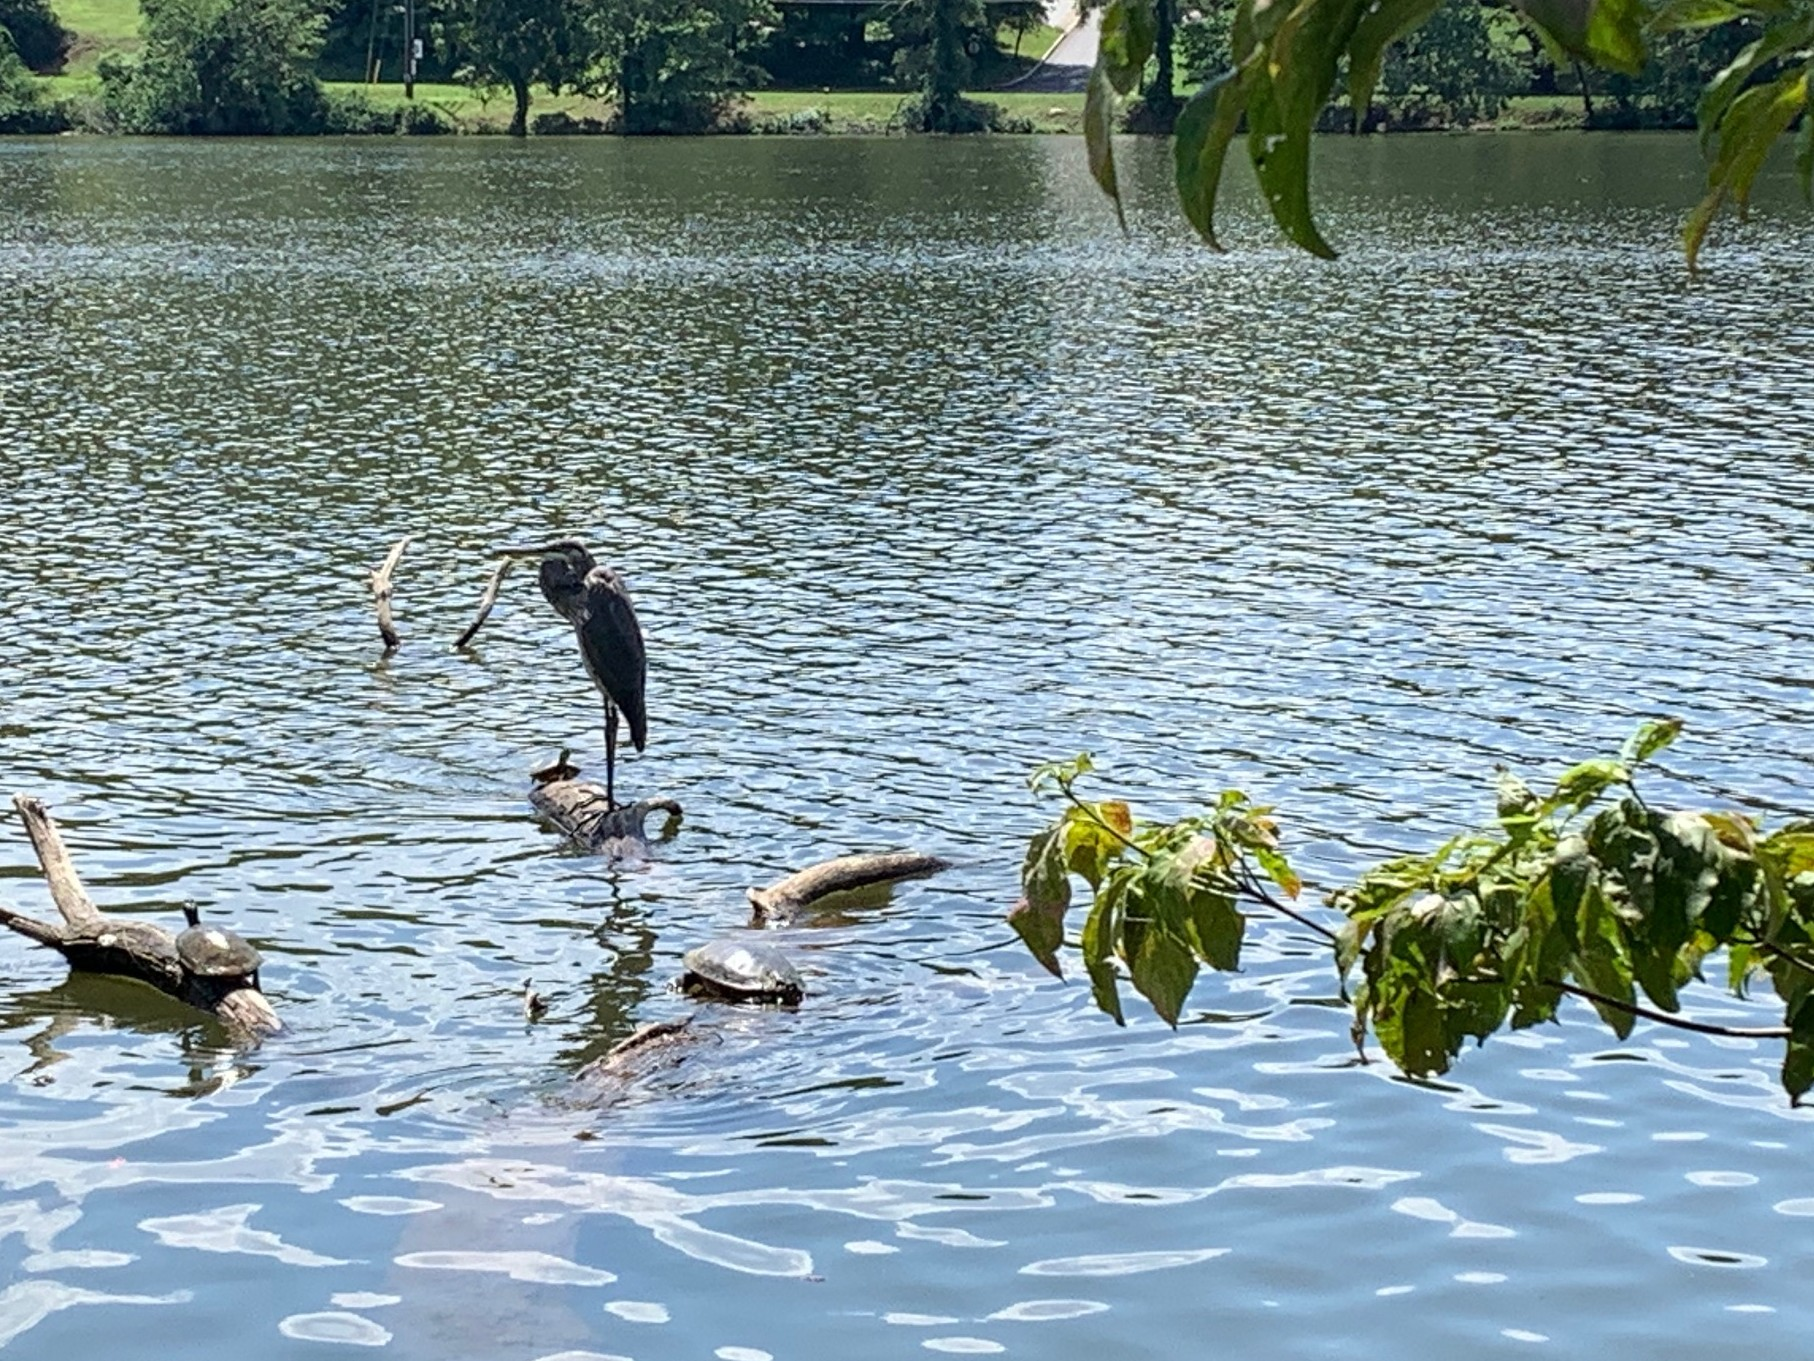 heron on the water at Beaver Lake